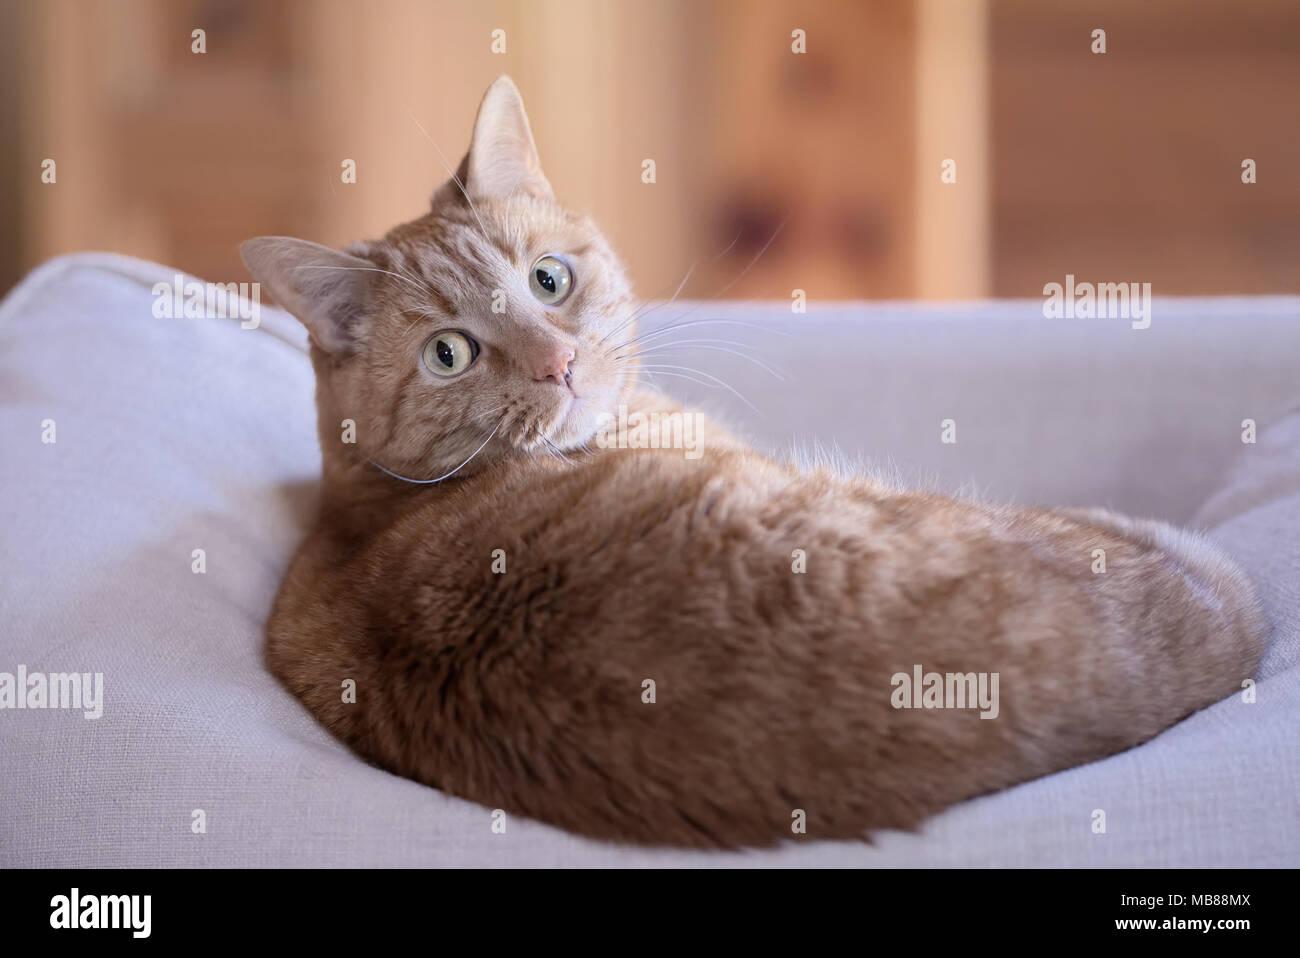 Orange tabby cat lying down on sofa cushion looking at camera. - Stock Image